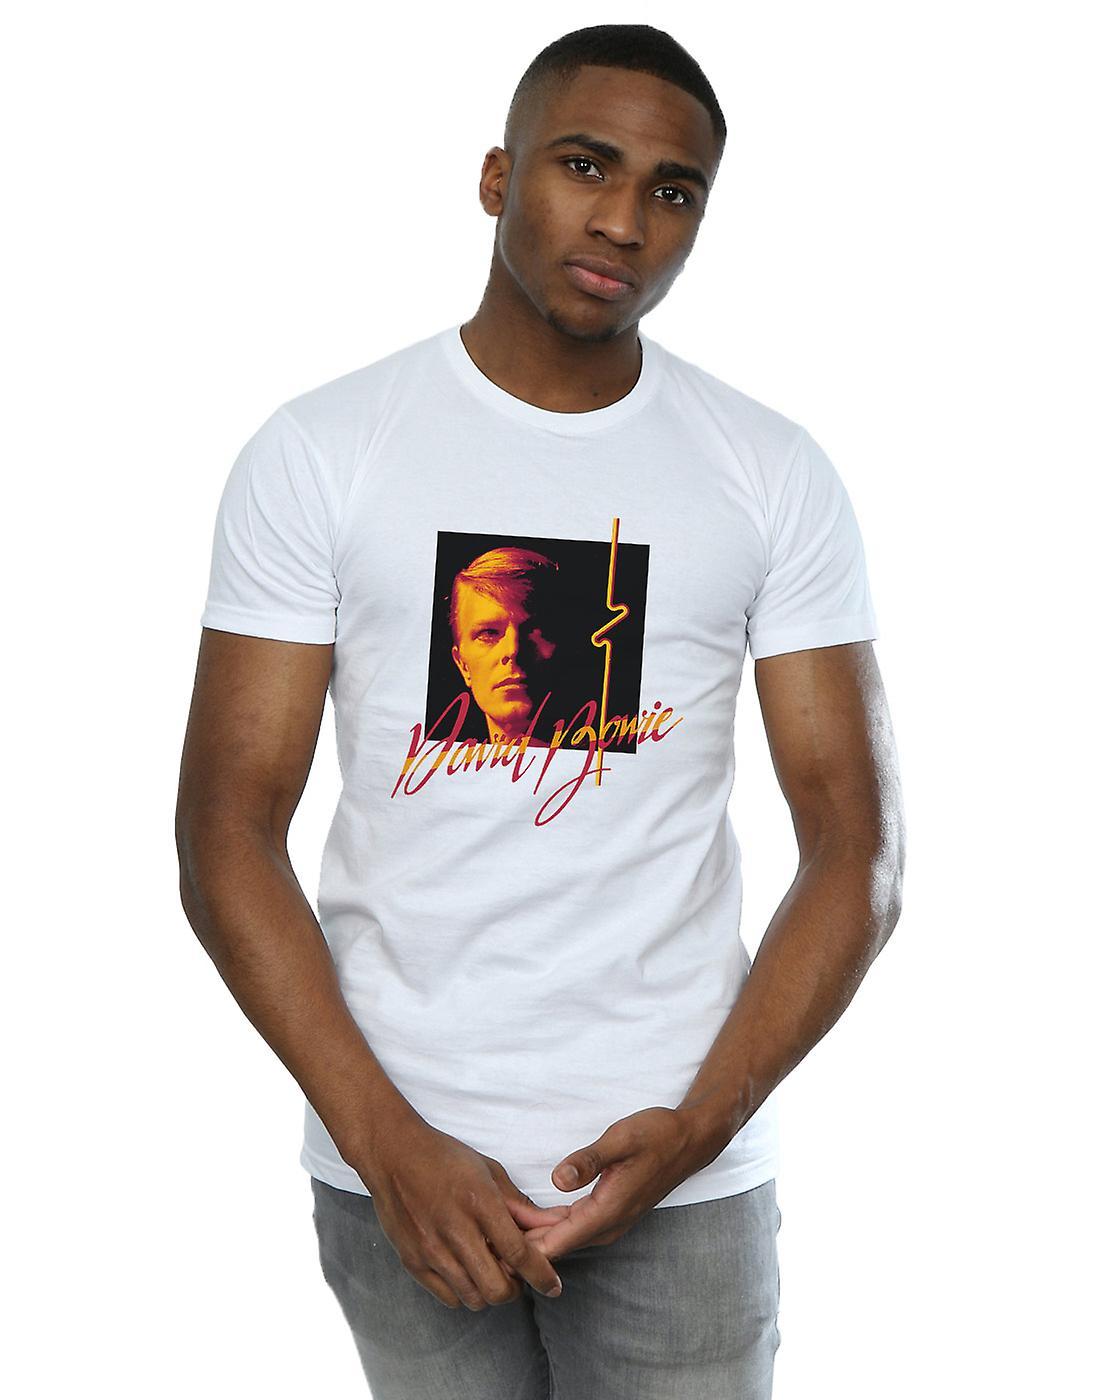 David Bowie Men's Photo Angle 90s T-Shirt